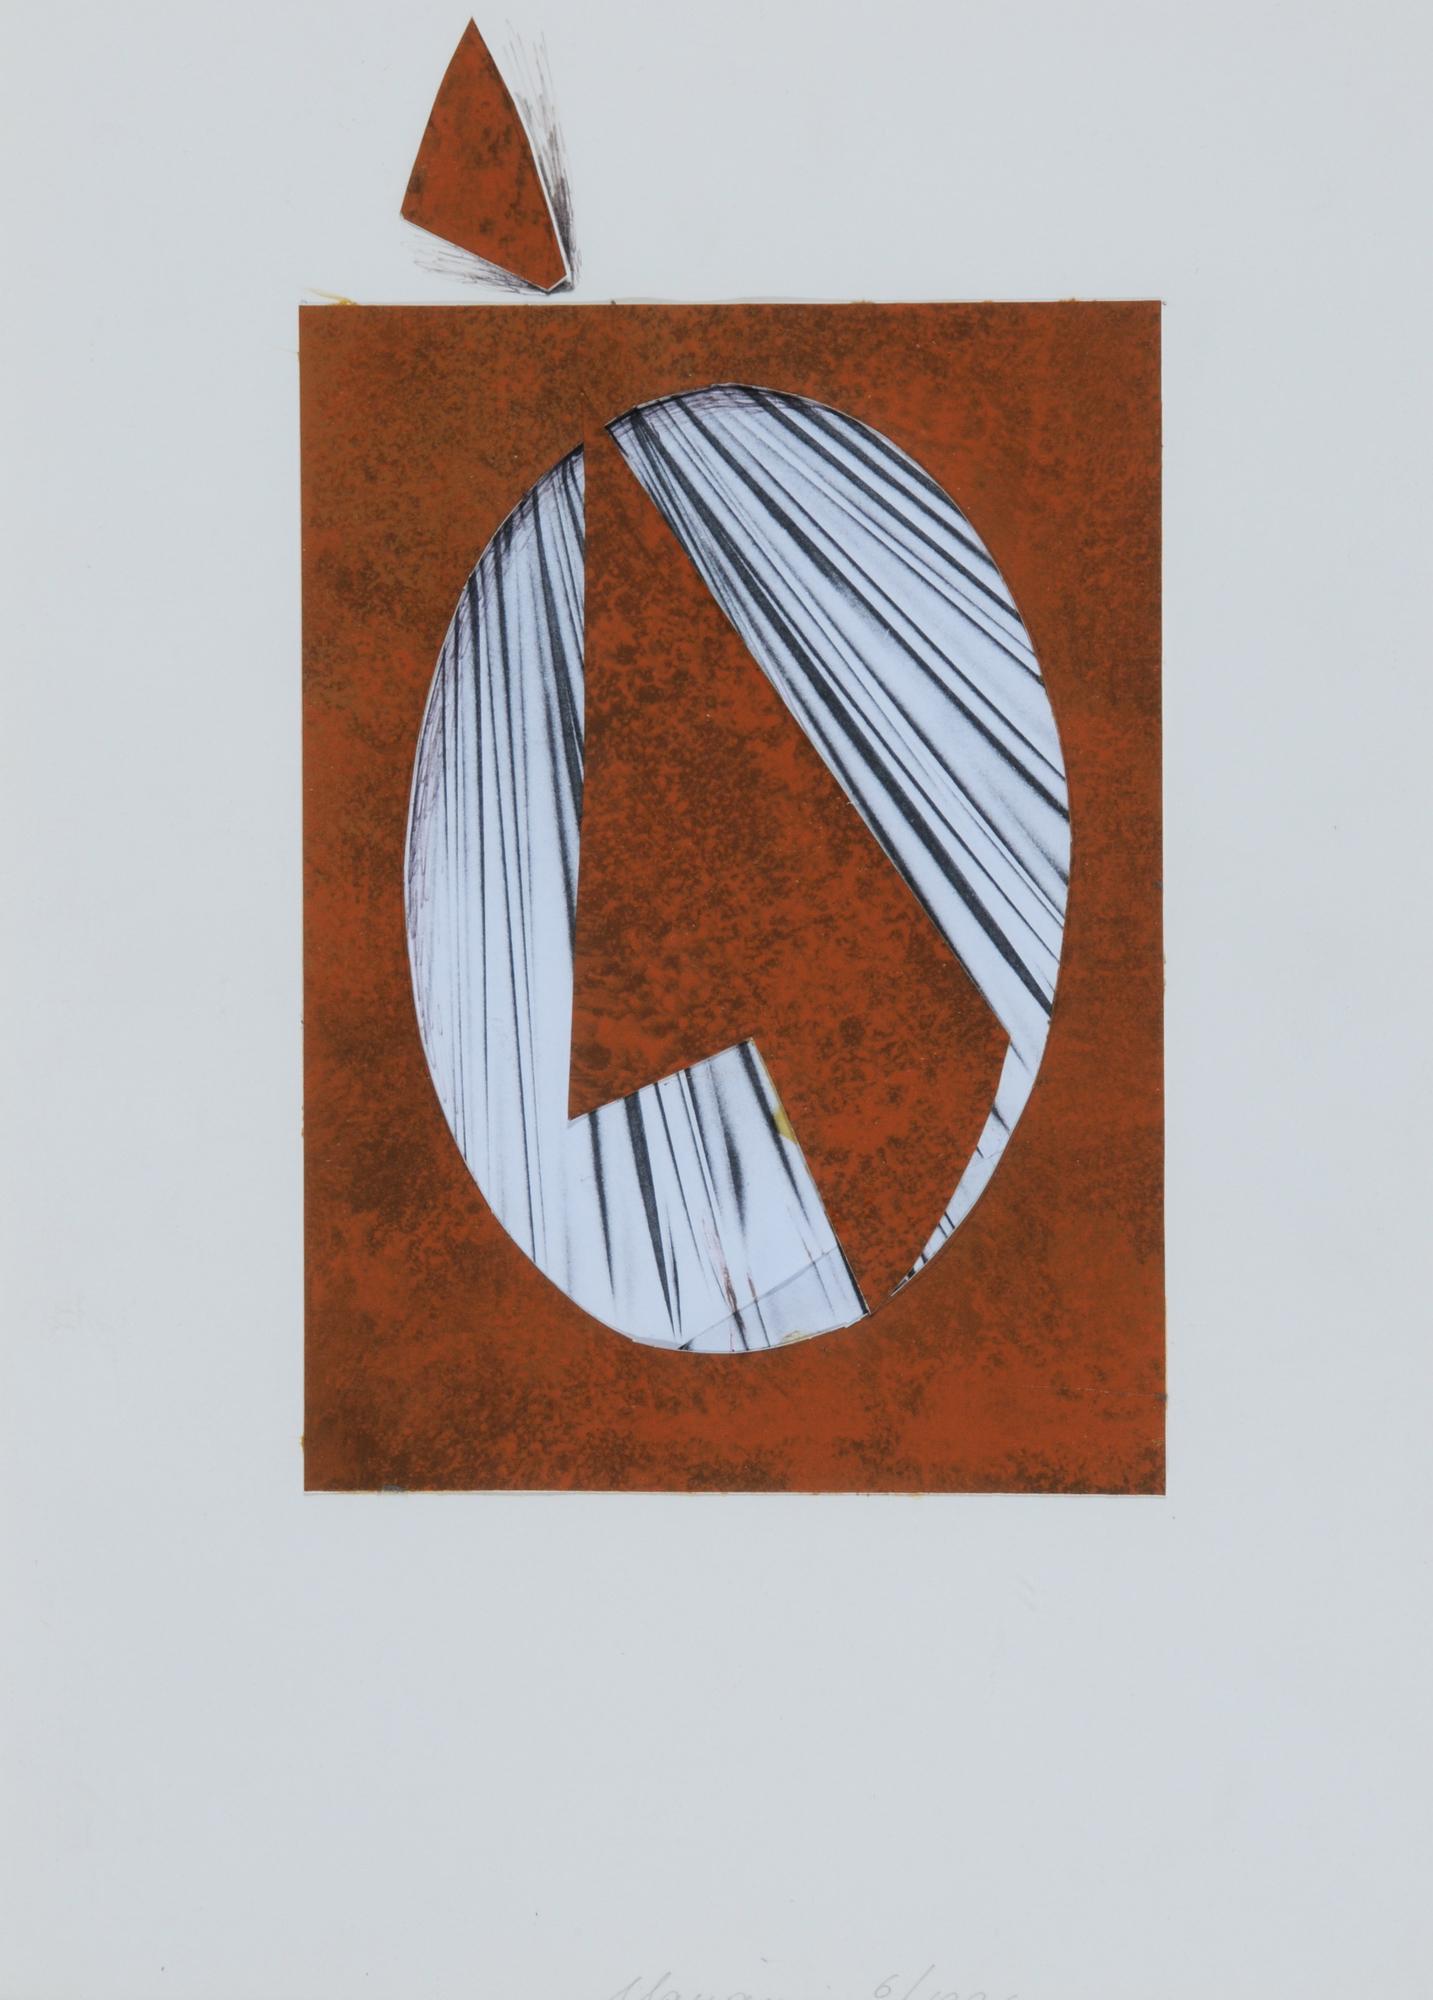 Mariani Umberto, Senza titolo (Untitled)